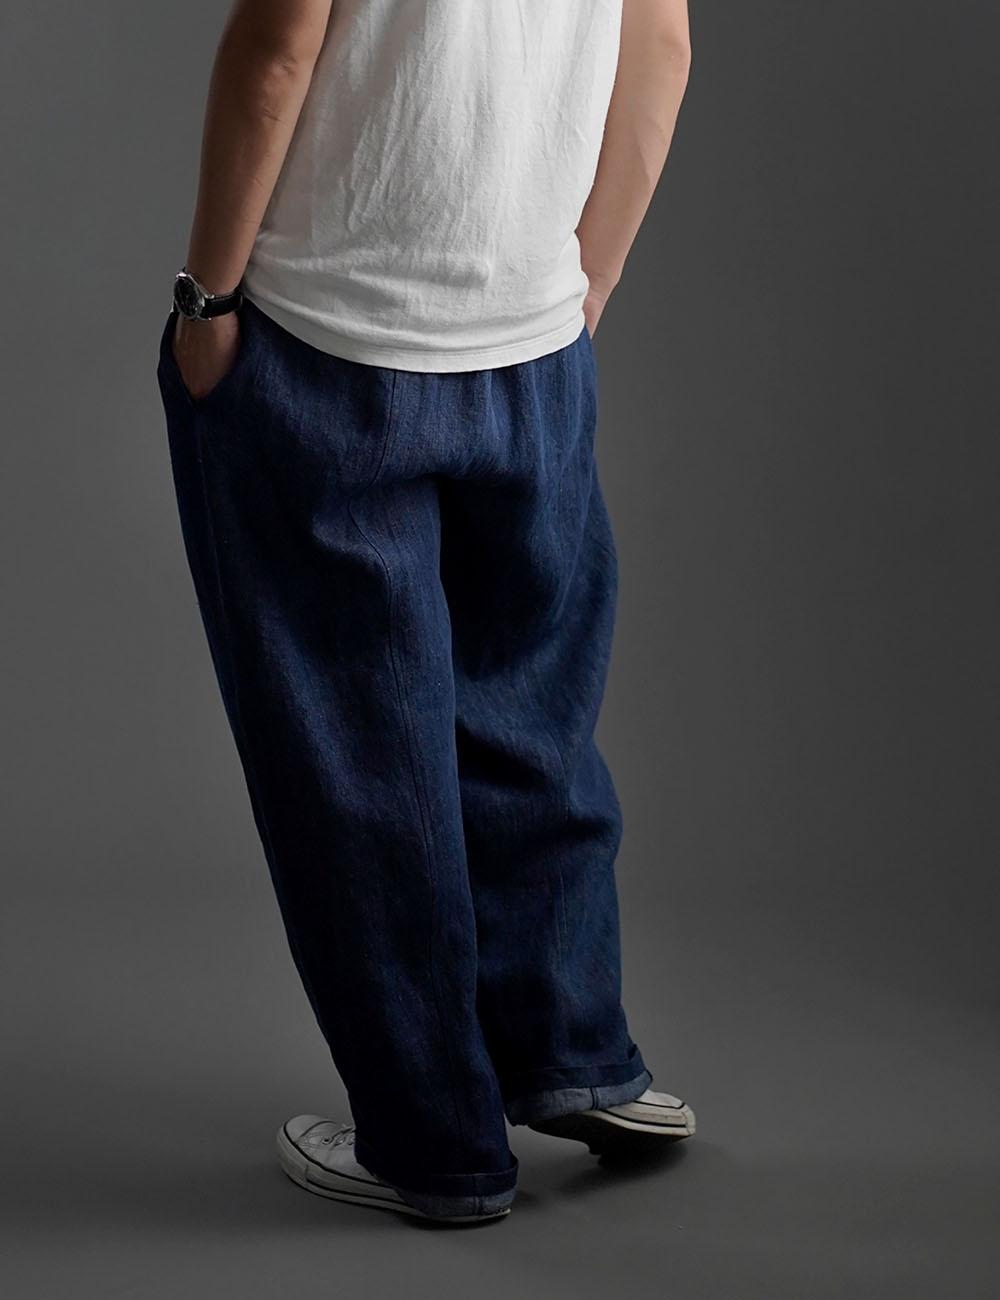 【wafu】Linen denim pants デニムバギーパンツ 男女兼用 /インディゴ b011b-ind3